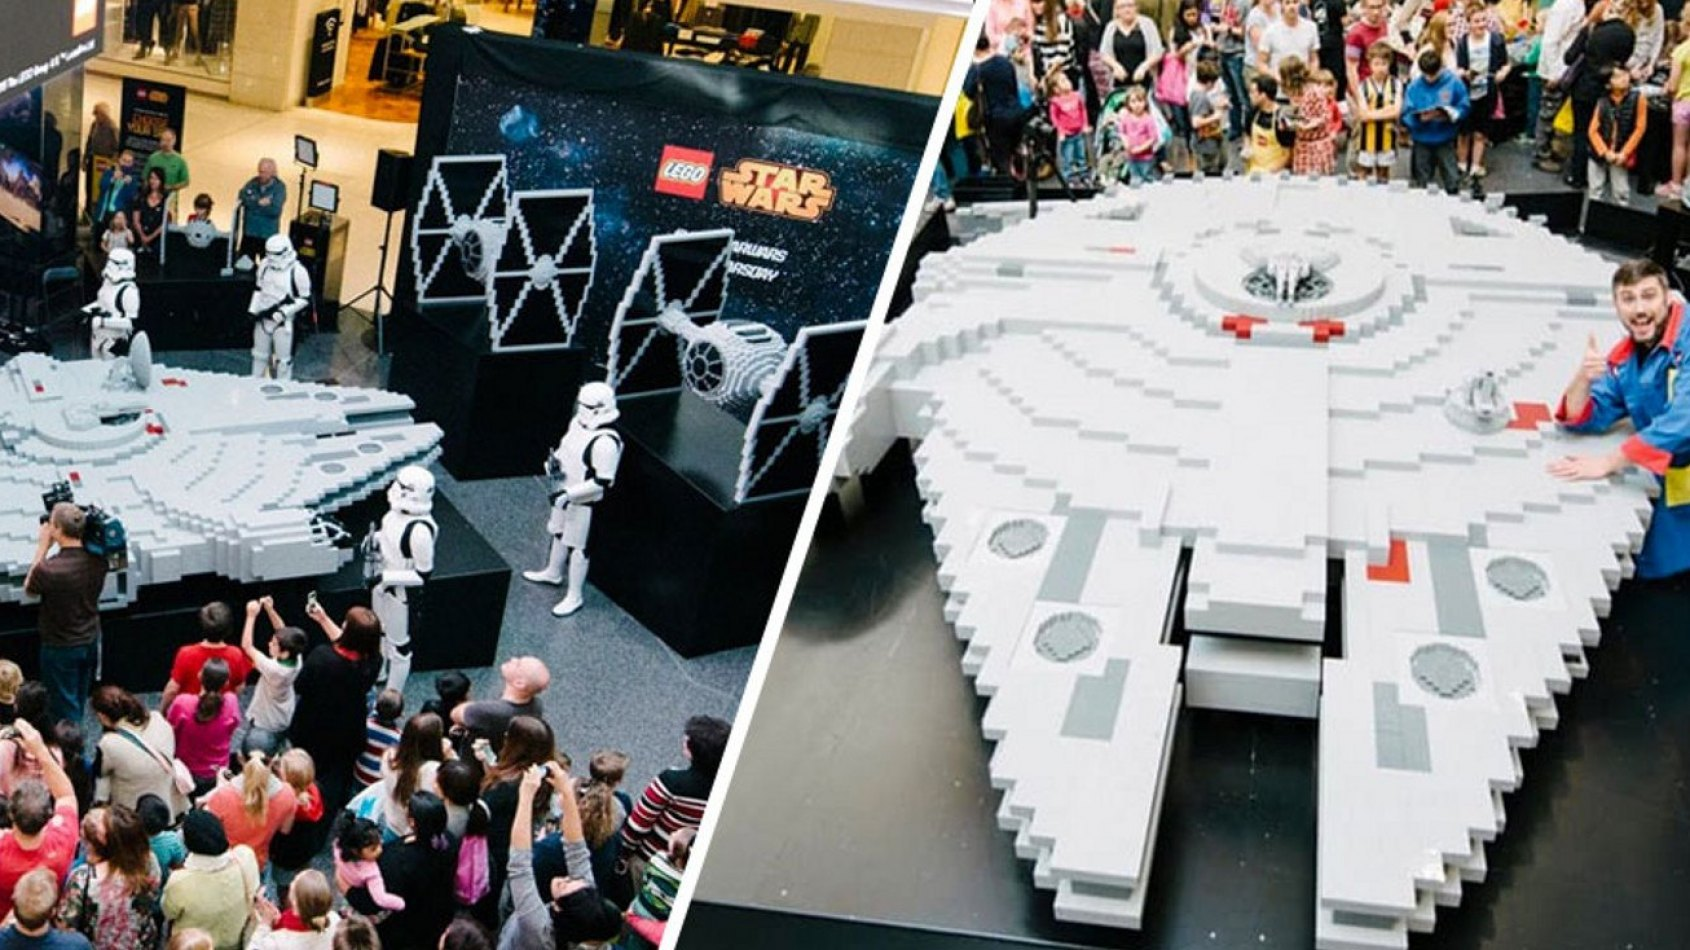 LEGO construit le plus grand Faucon Millenium au monde.